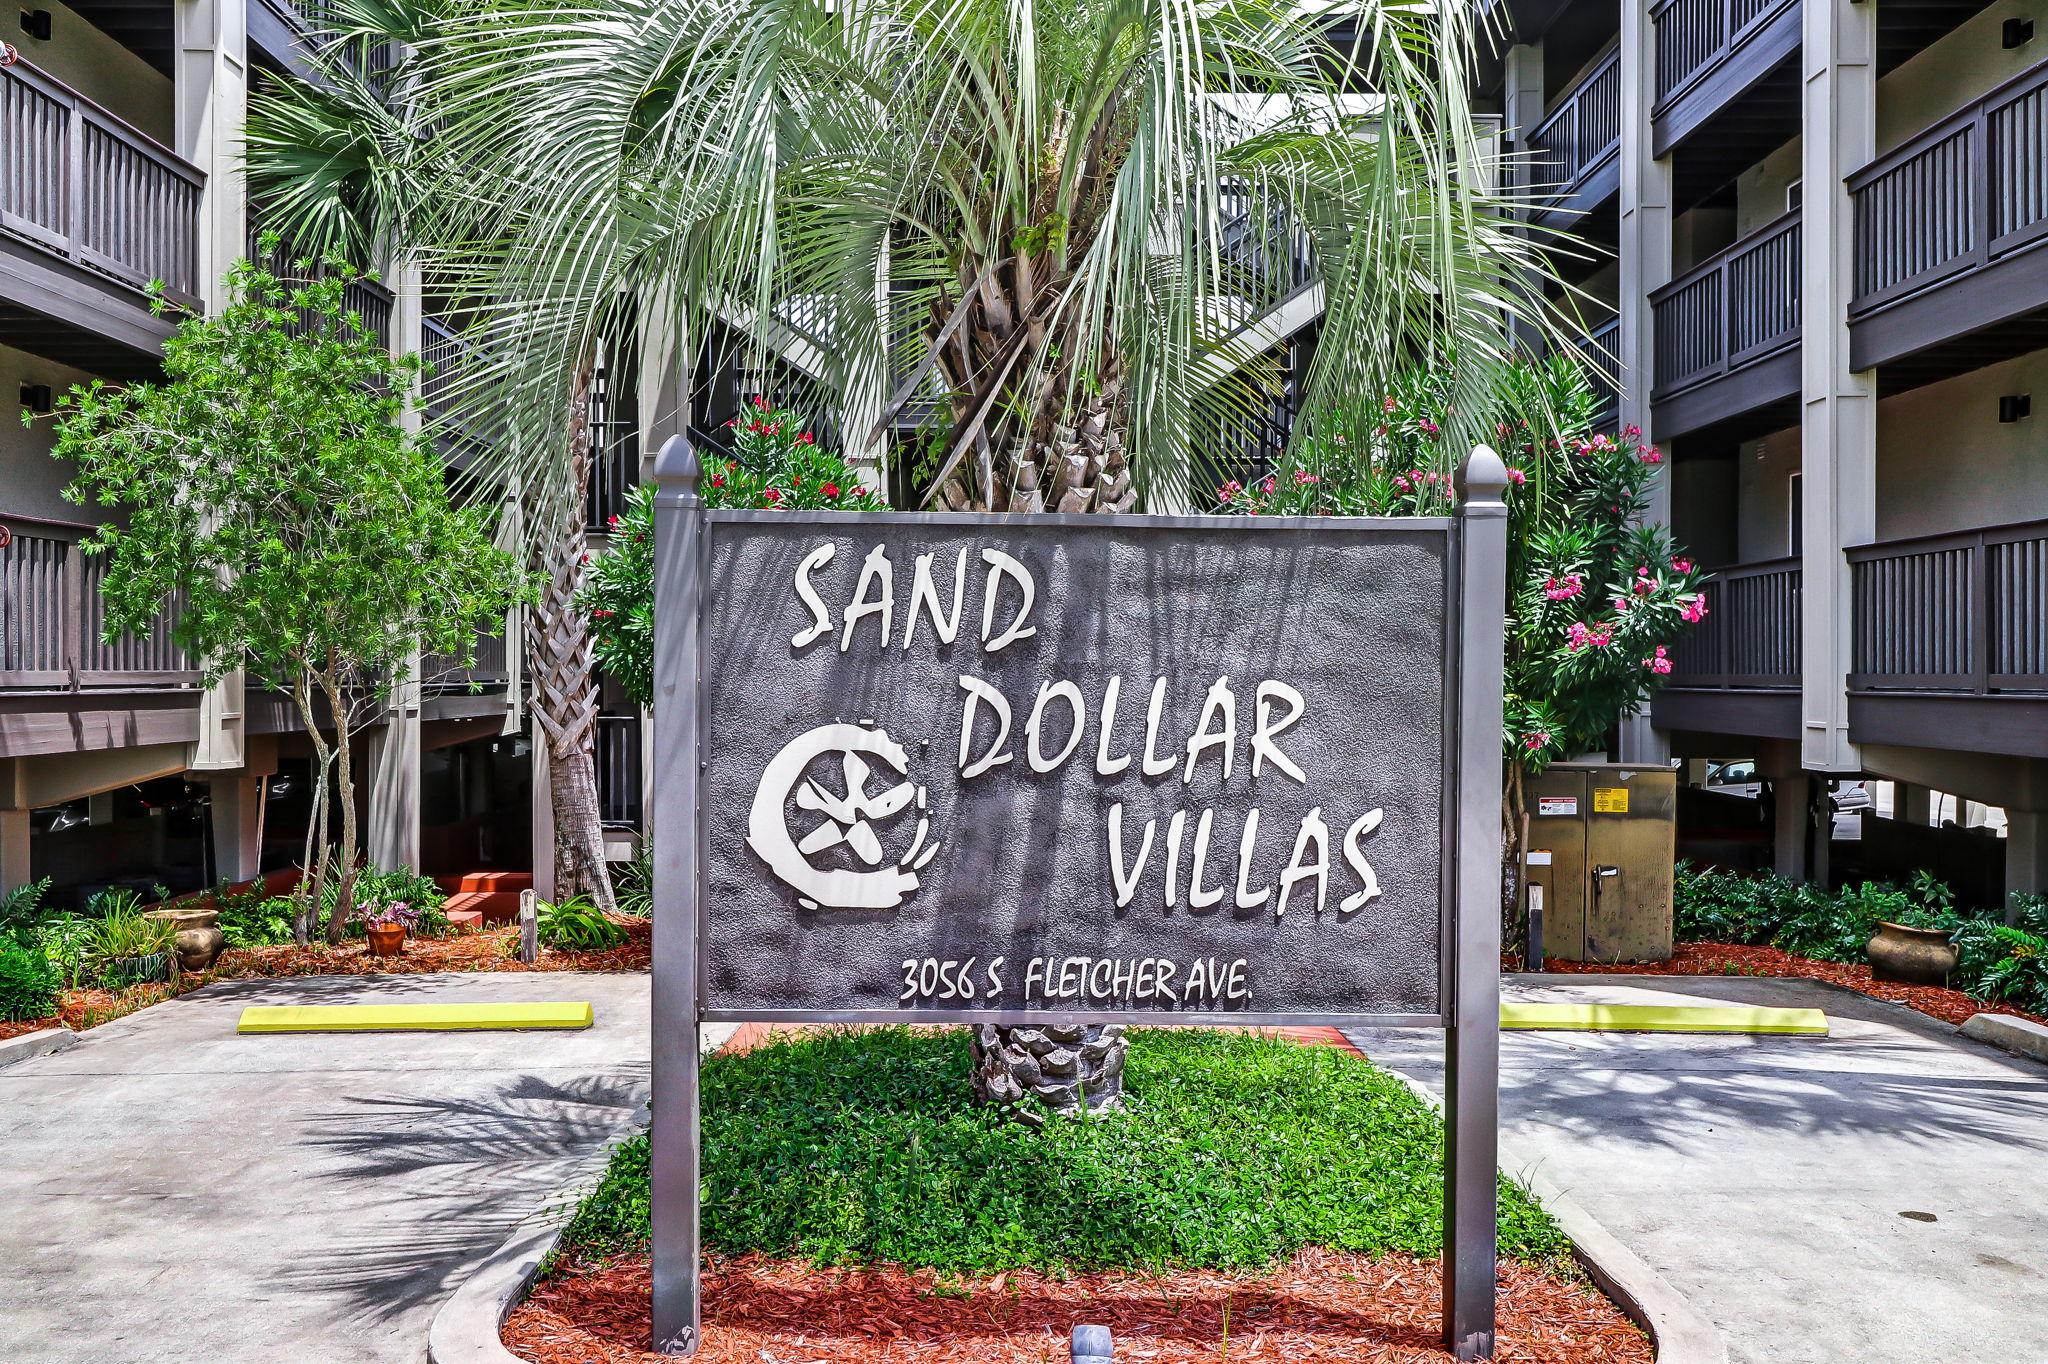 Sand Dollar Villas